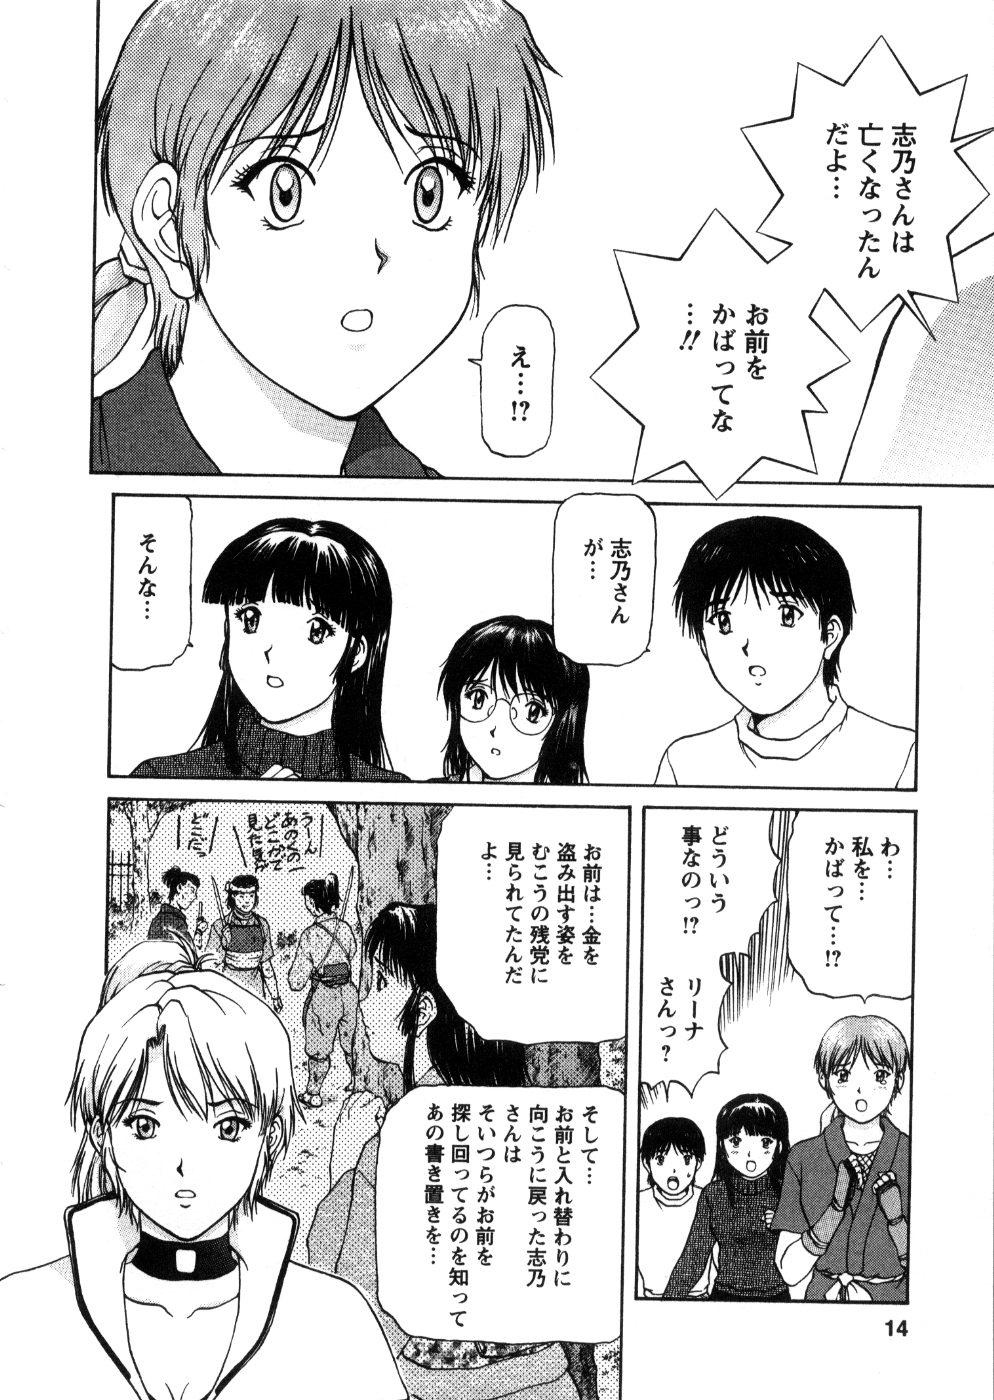 Oneechan-tachi ga Yatte Kuru 03 15